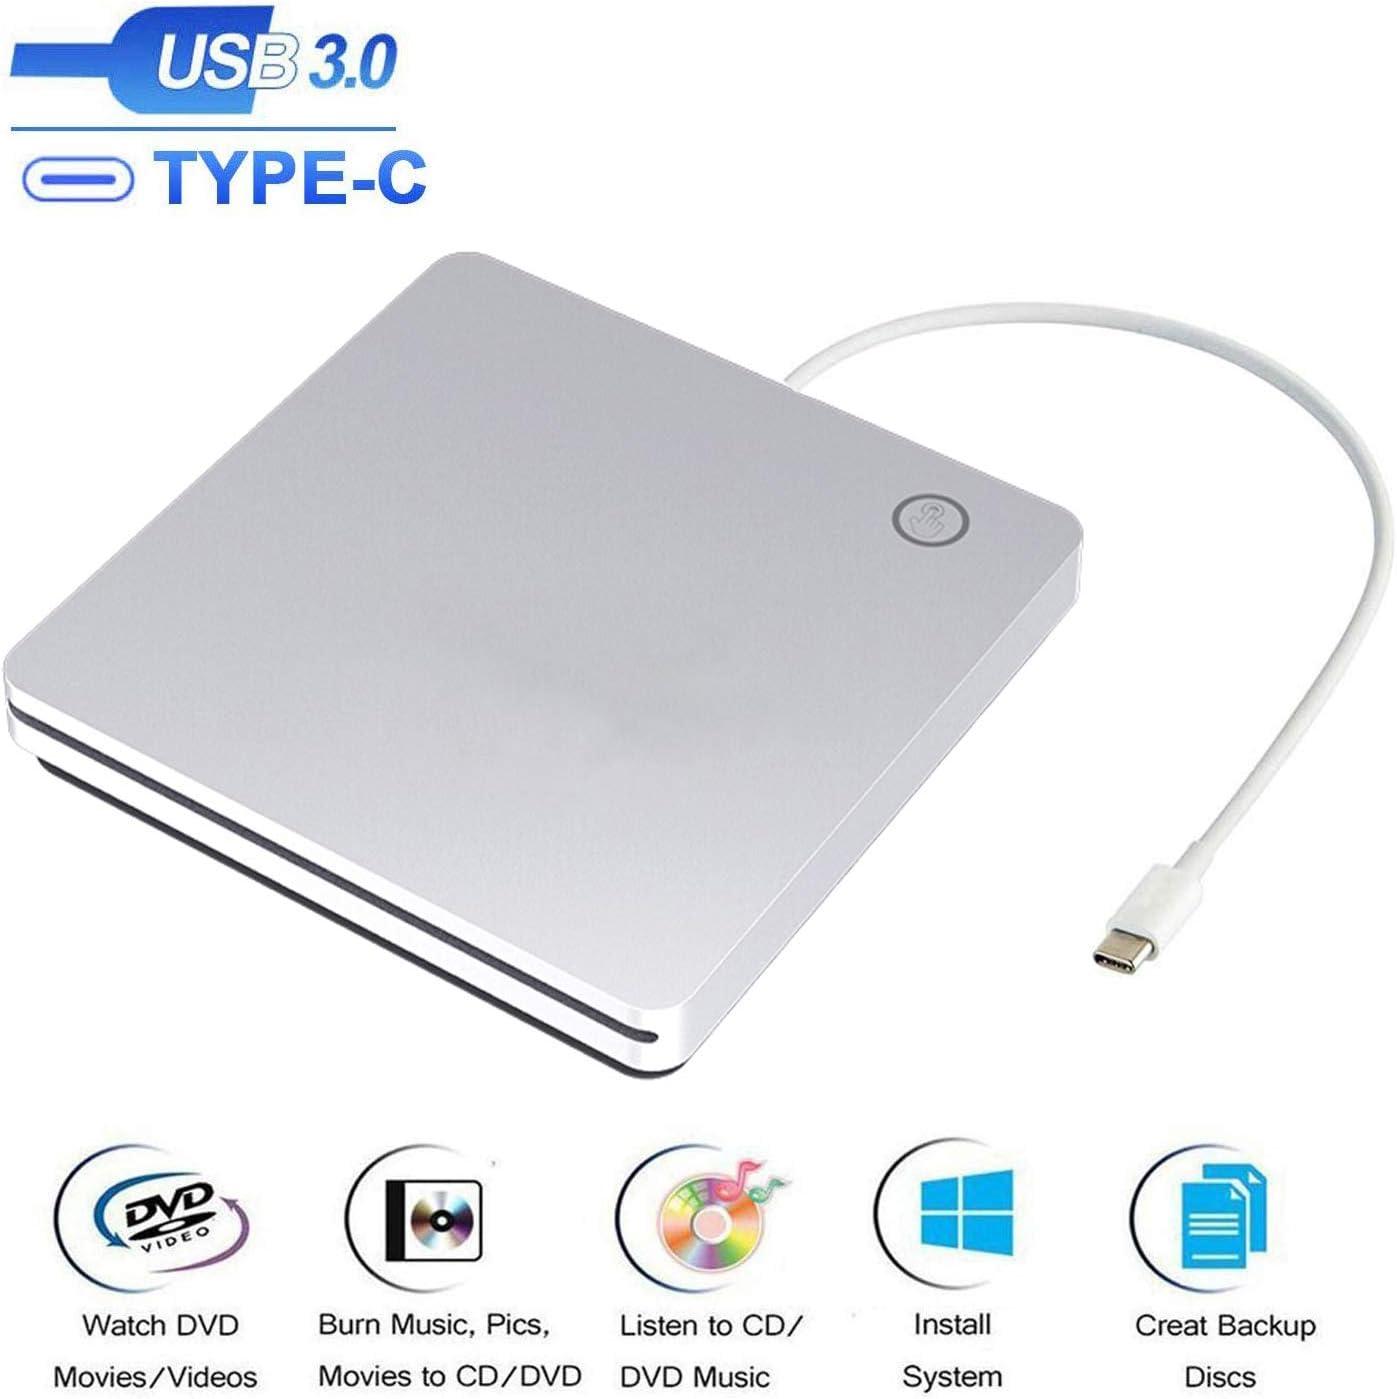 Xglysmyc External USB C Superdrive Ultra Slim USB3.0 CD DVD Drive Burner External CD/DVD +/-RW Writer Reader Player with High Speed Data for MacBook Pro Air/Laptop/Windows/Mac OSX -Silver